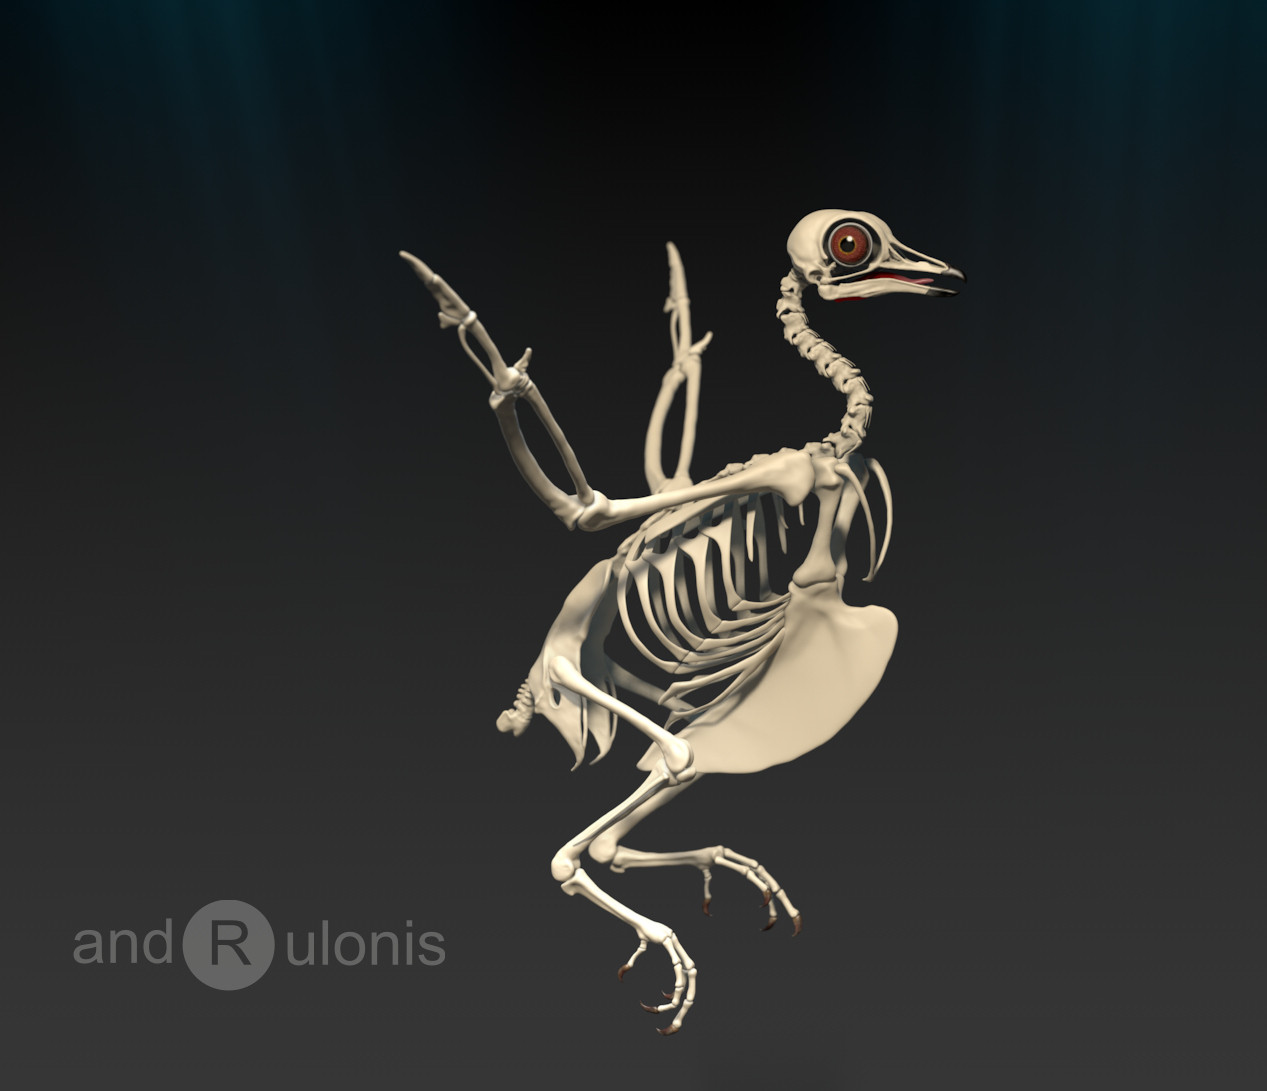 Dariusz andrulonis ptak 09